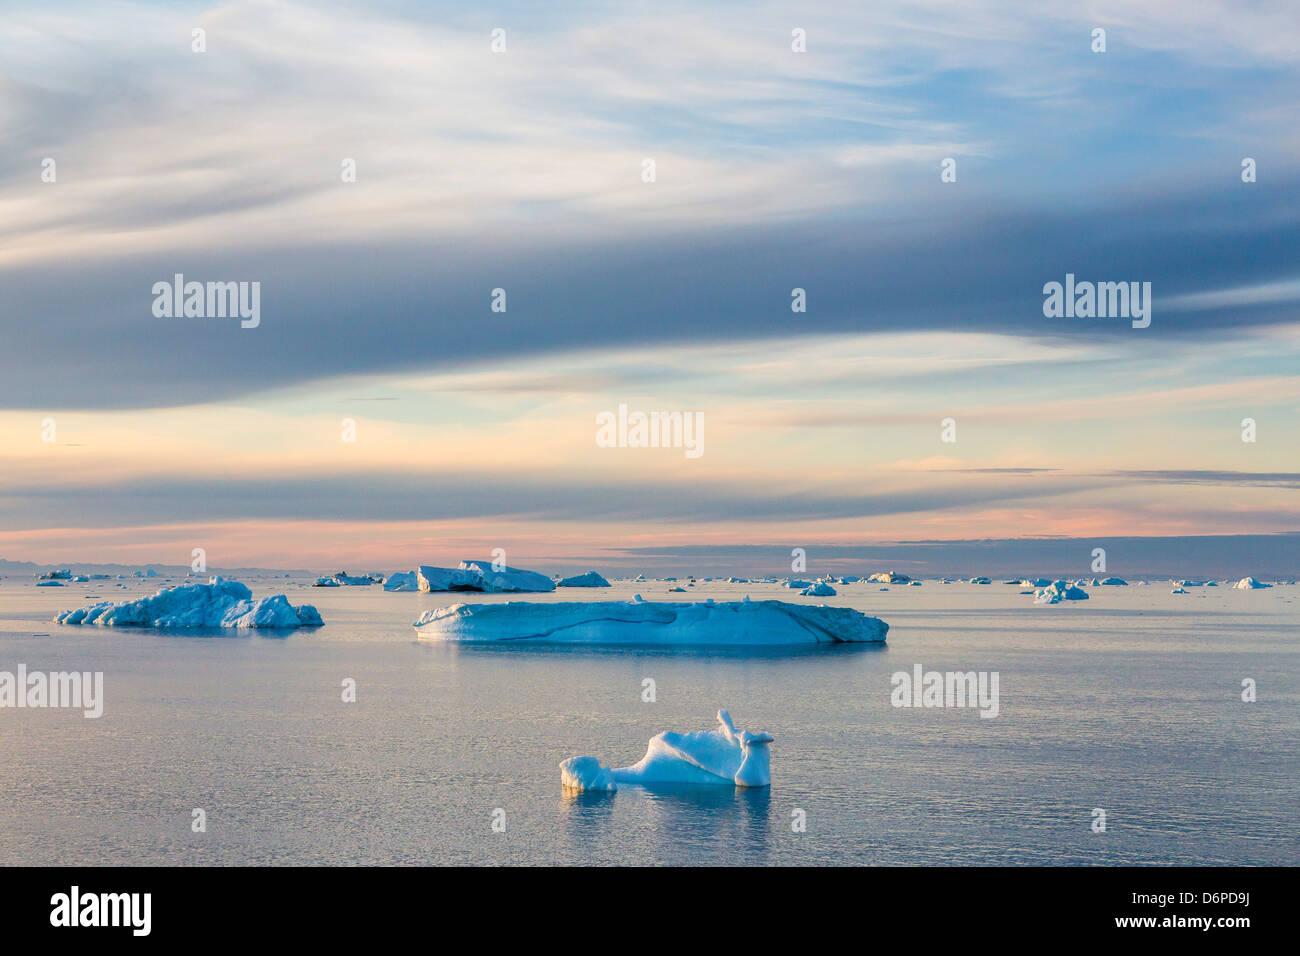 Icebergs in Kong Oscar Fjord, Northeast Greenland, Polar Regions - Stock Image